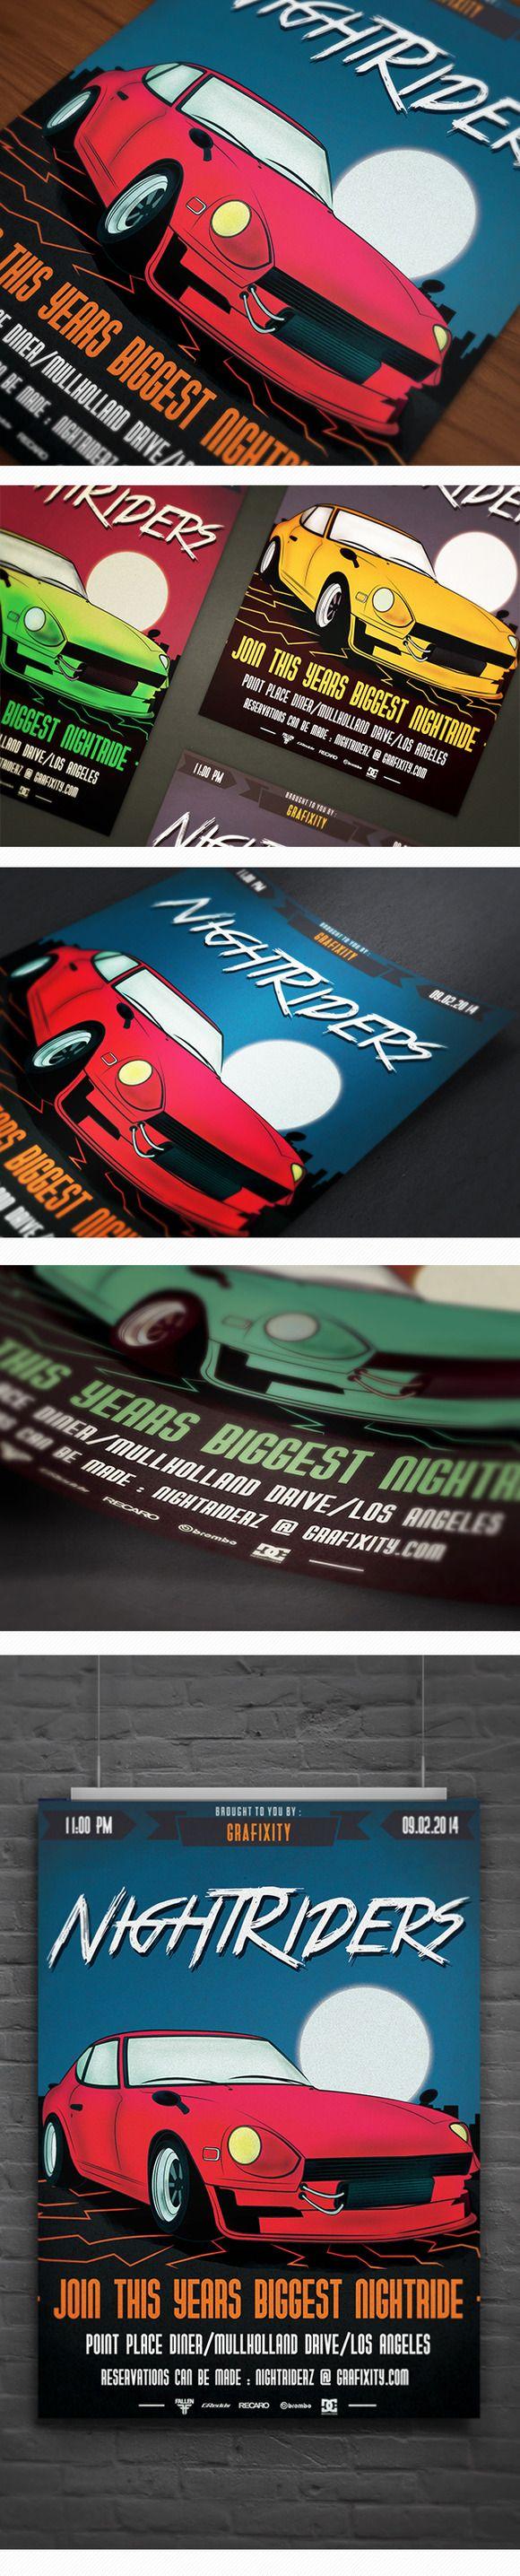 Retro Car meeting poster/flyer VI by DigitavernShop on Creative Market